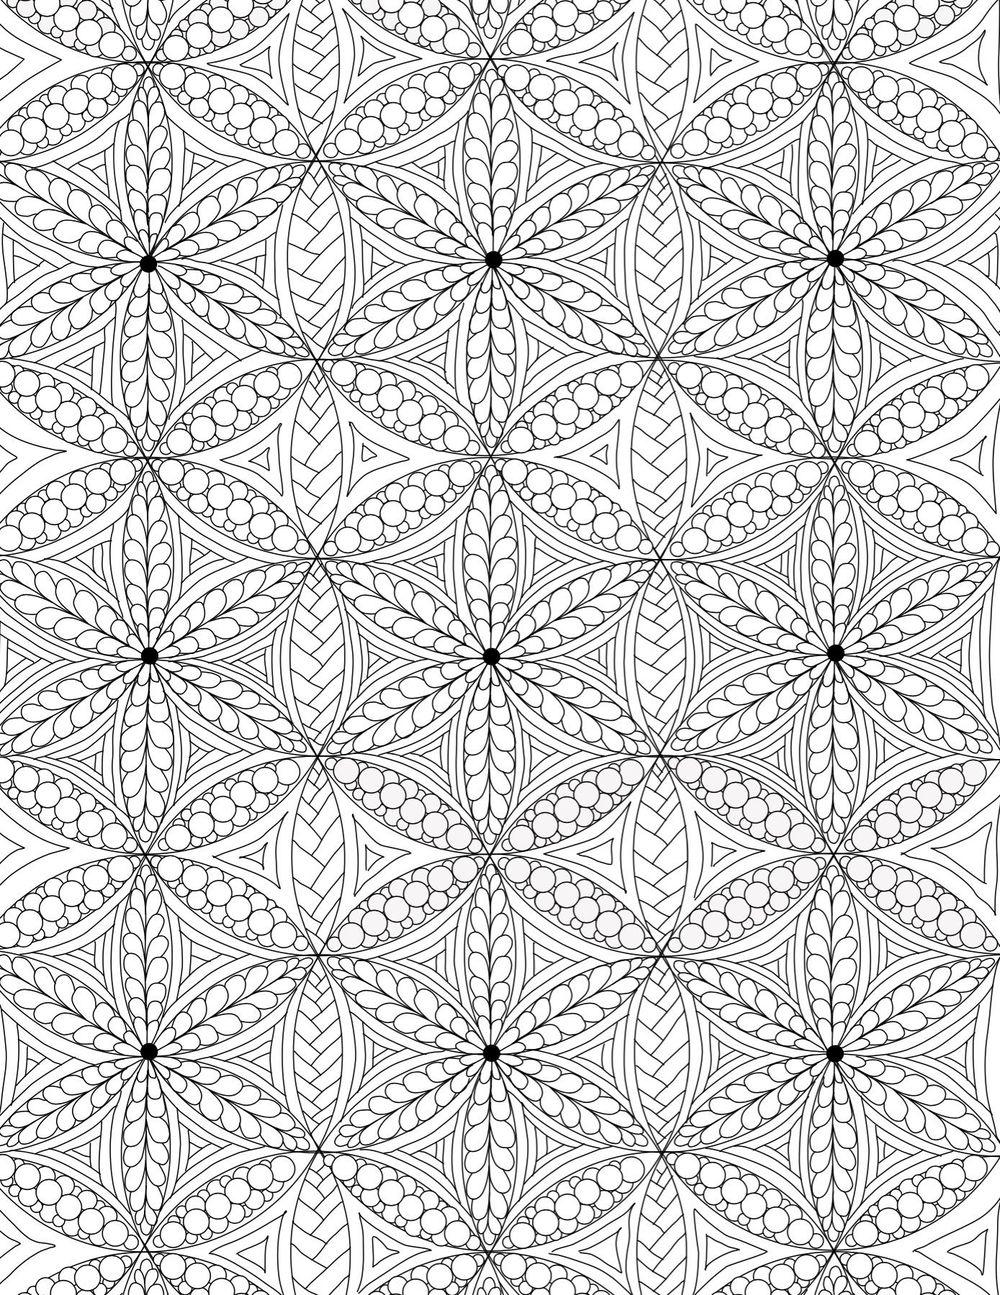 Finished Full Page Mandala - image 1 - student project